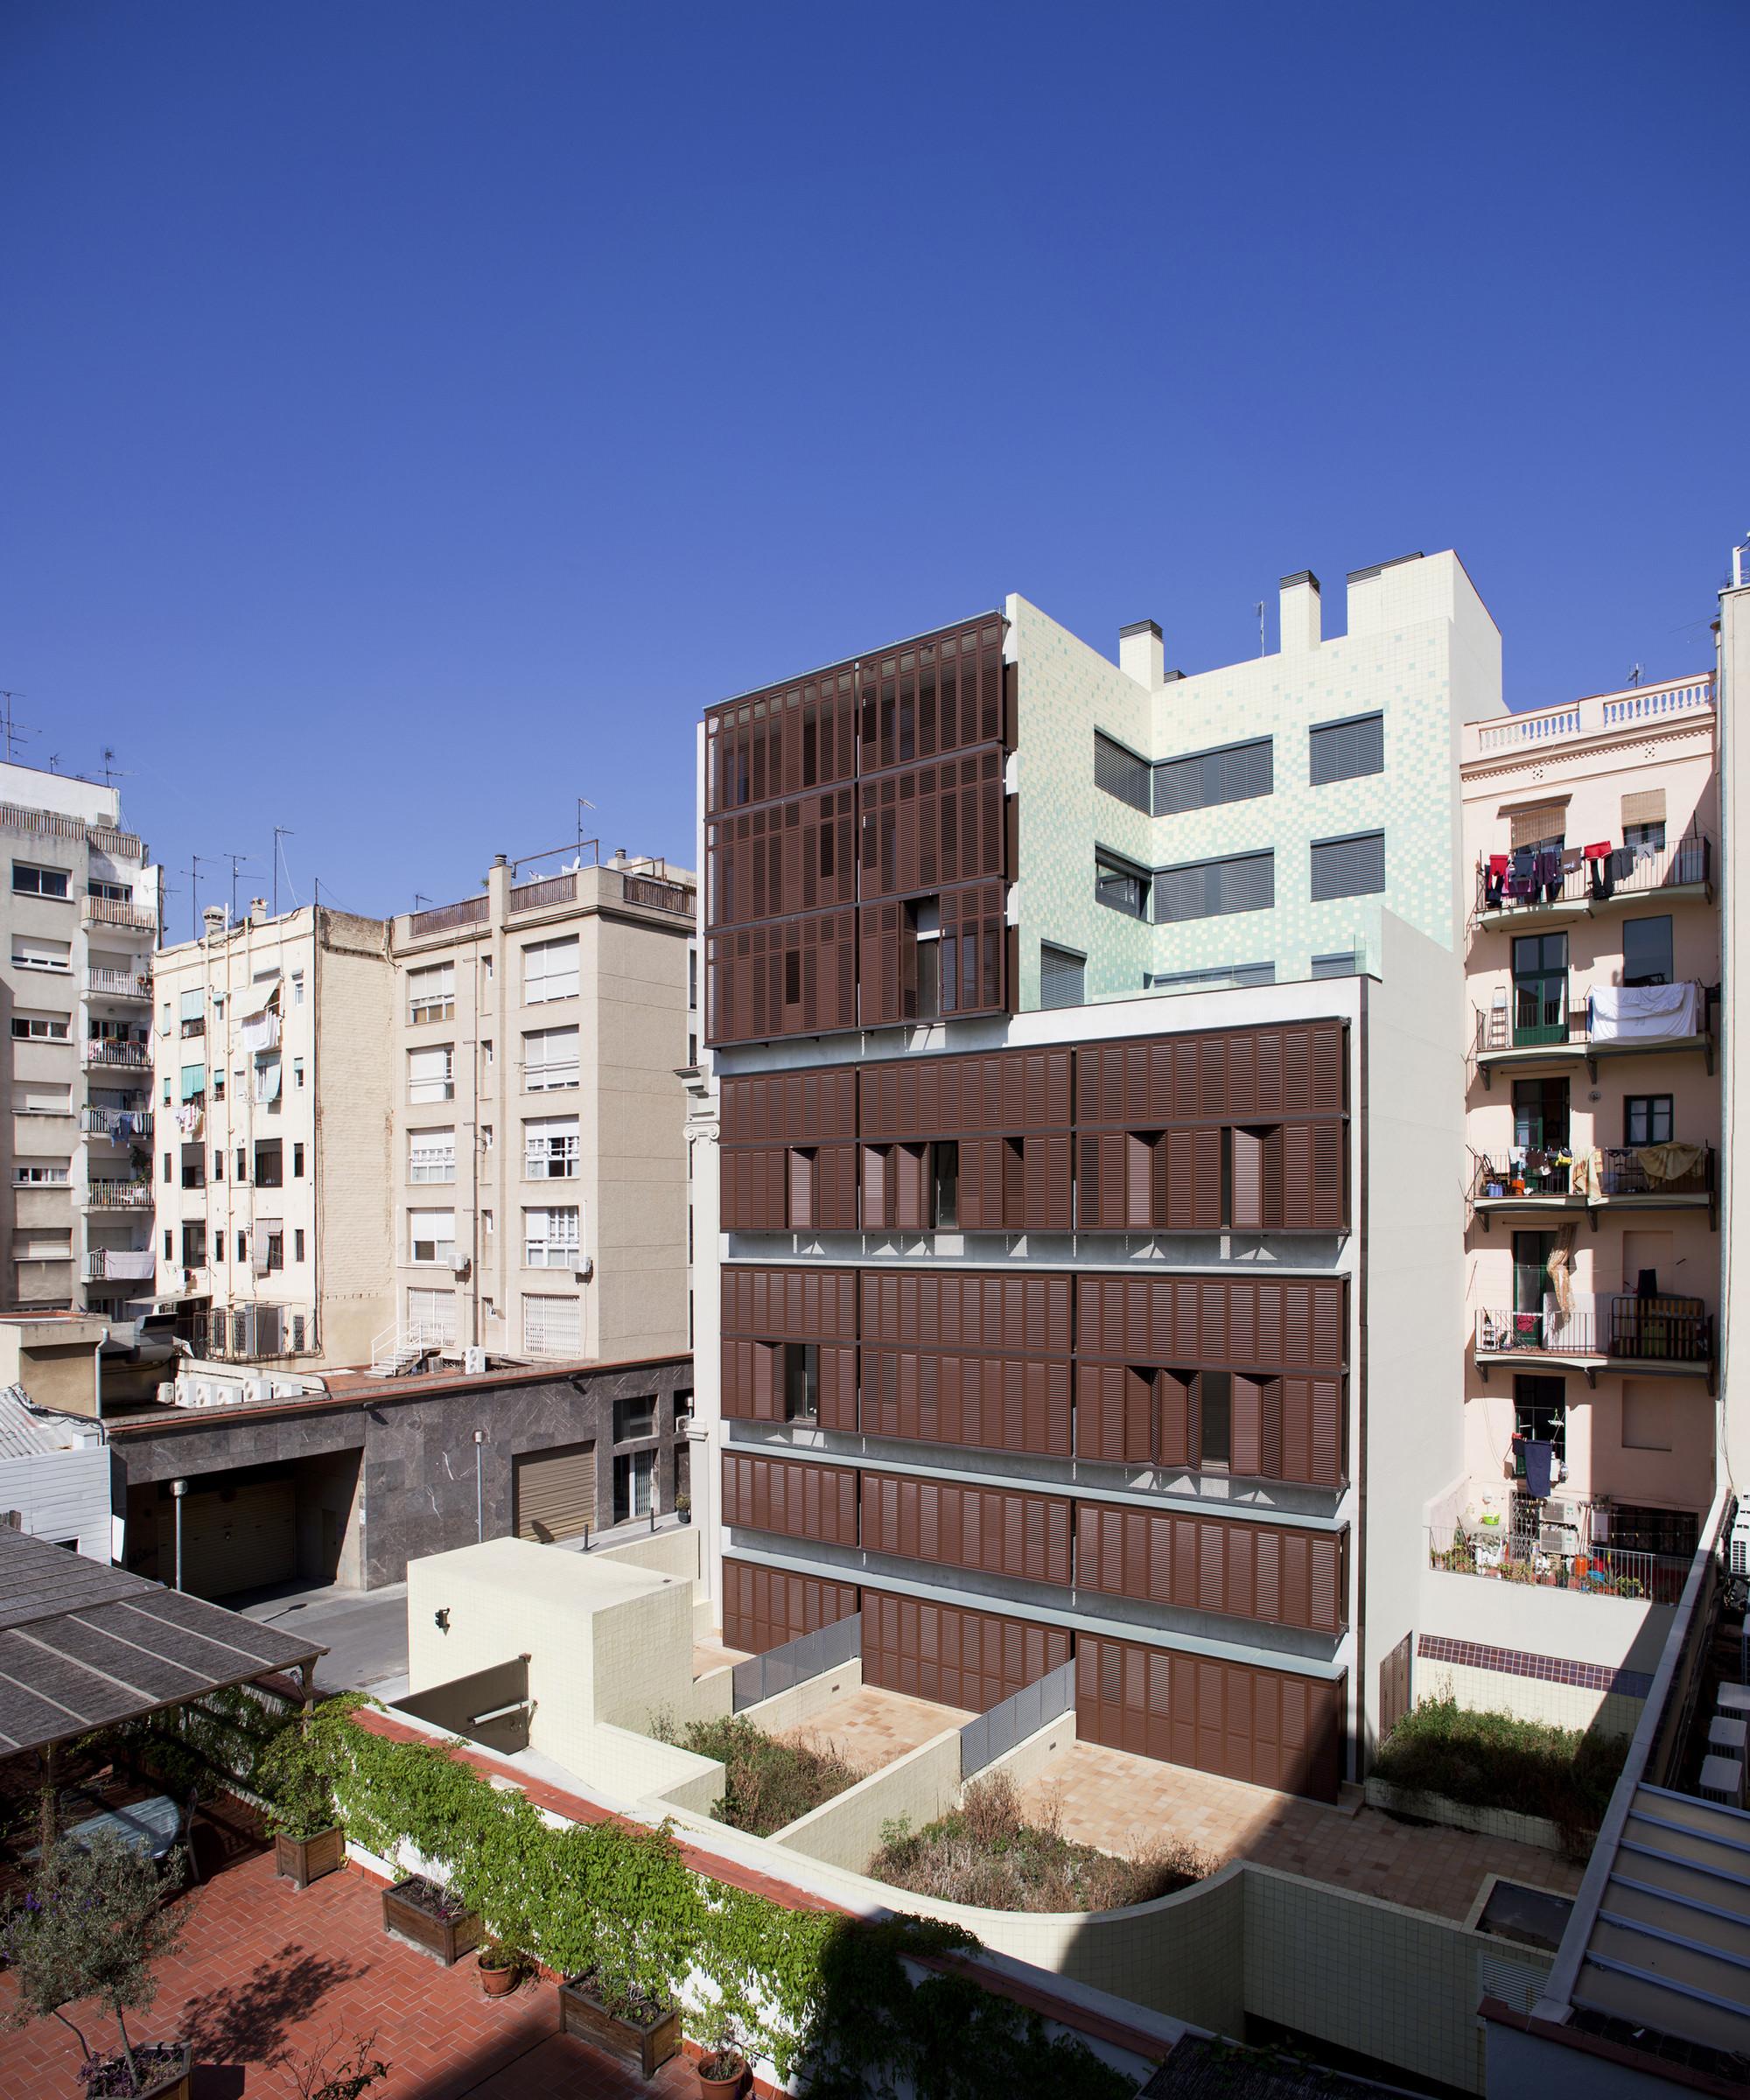 30 Houses Building / Rahola Vidal